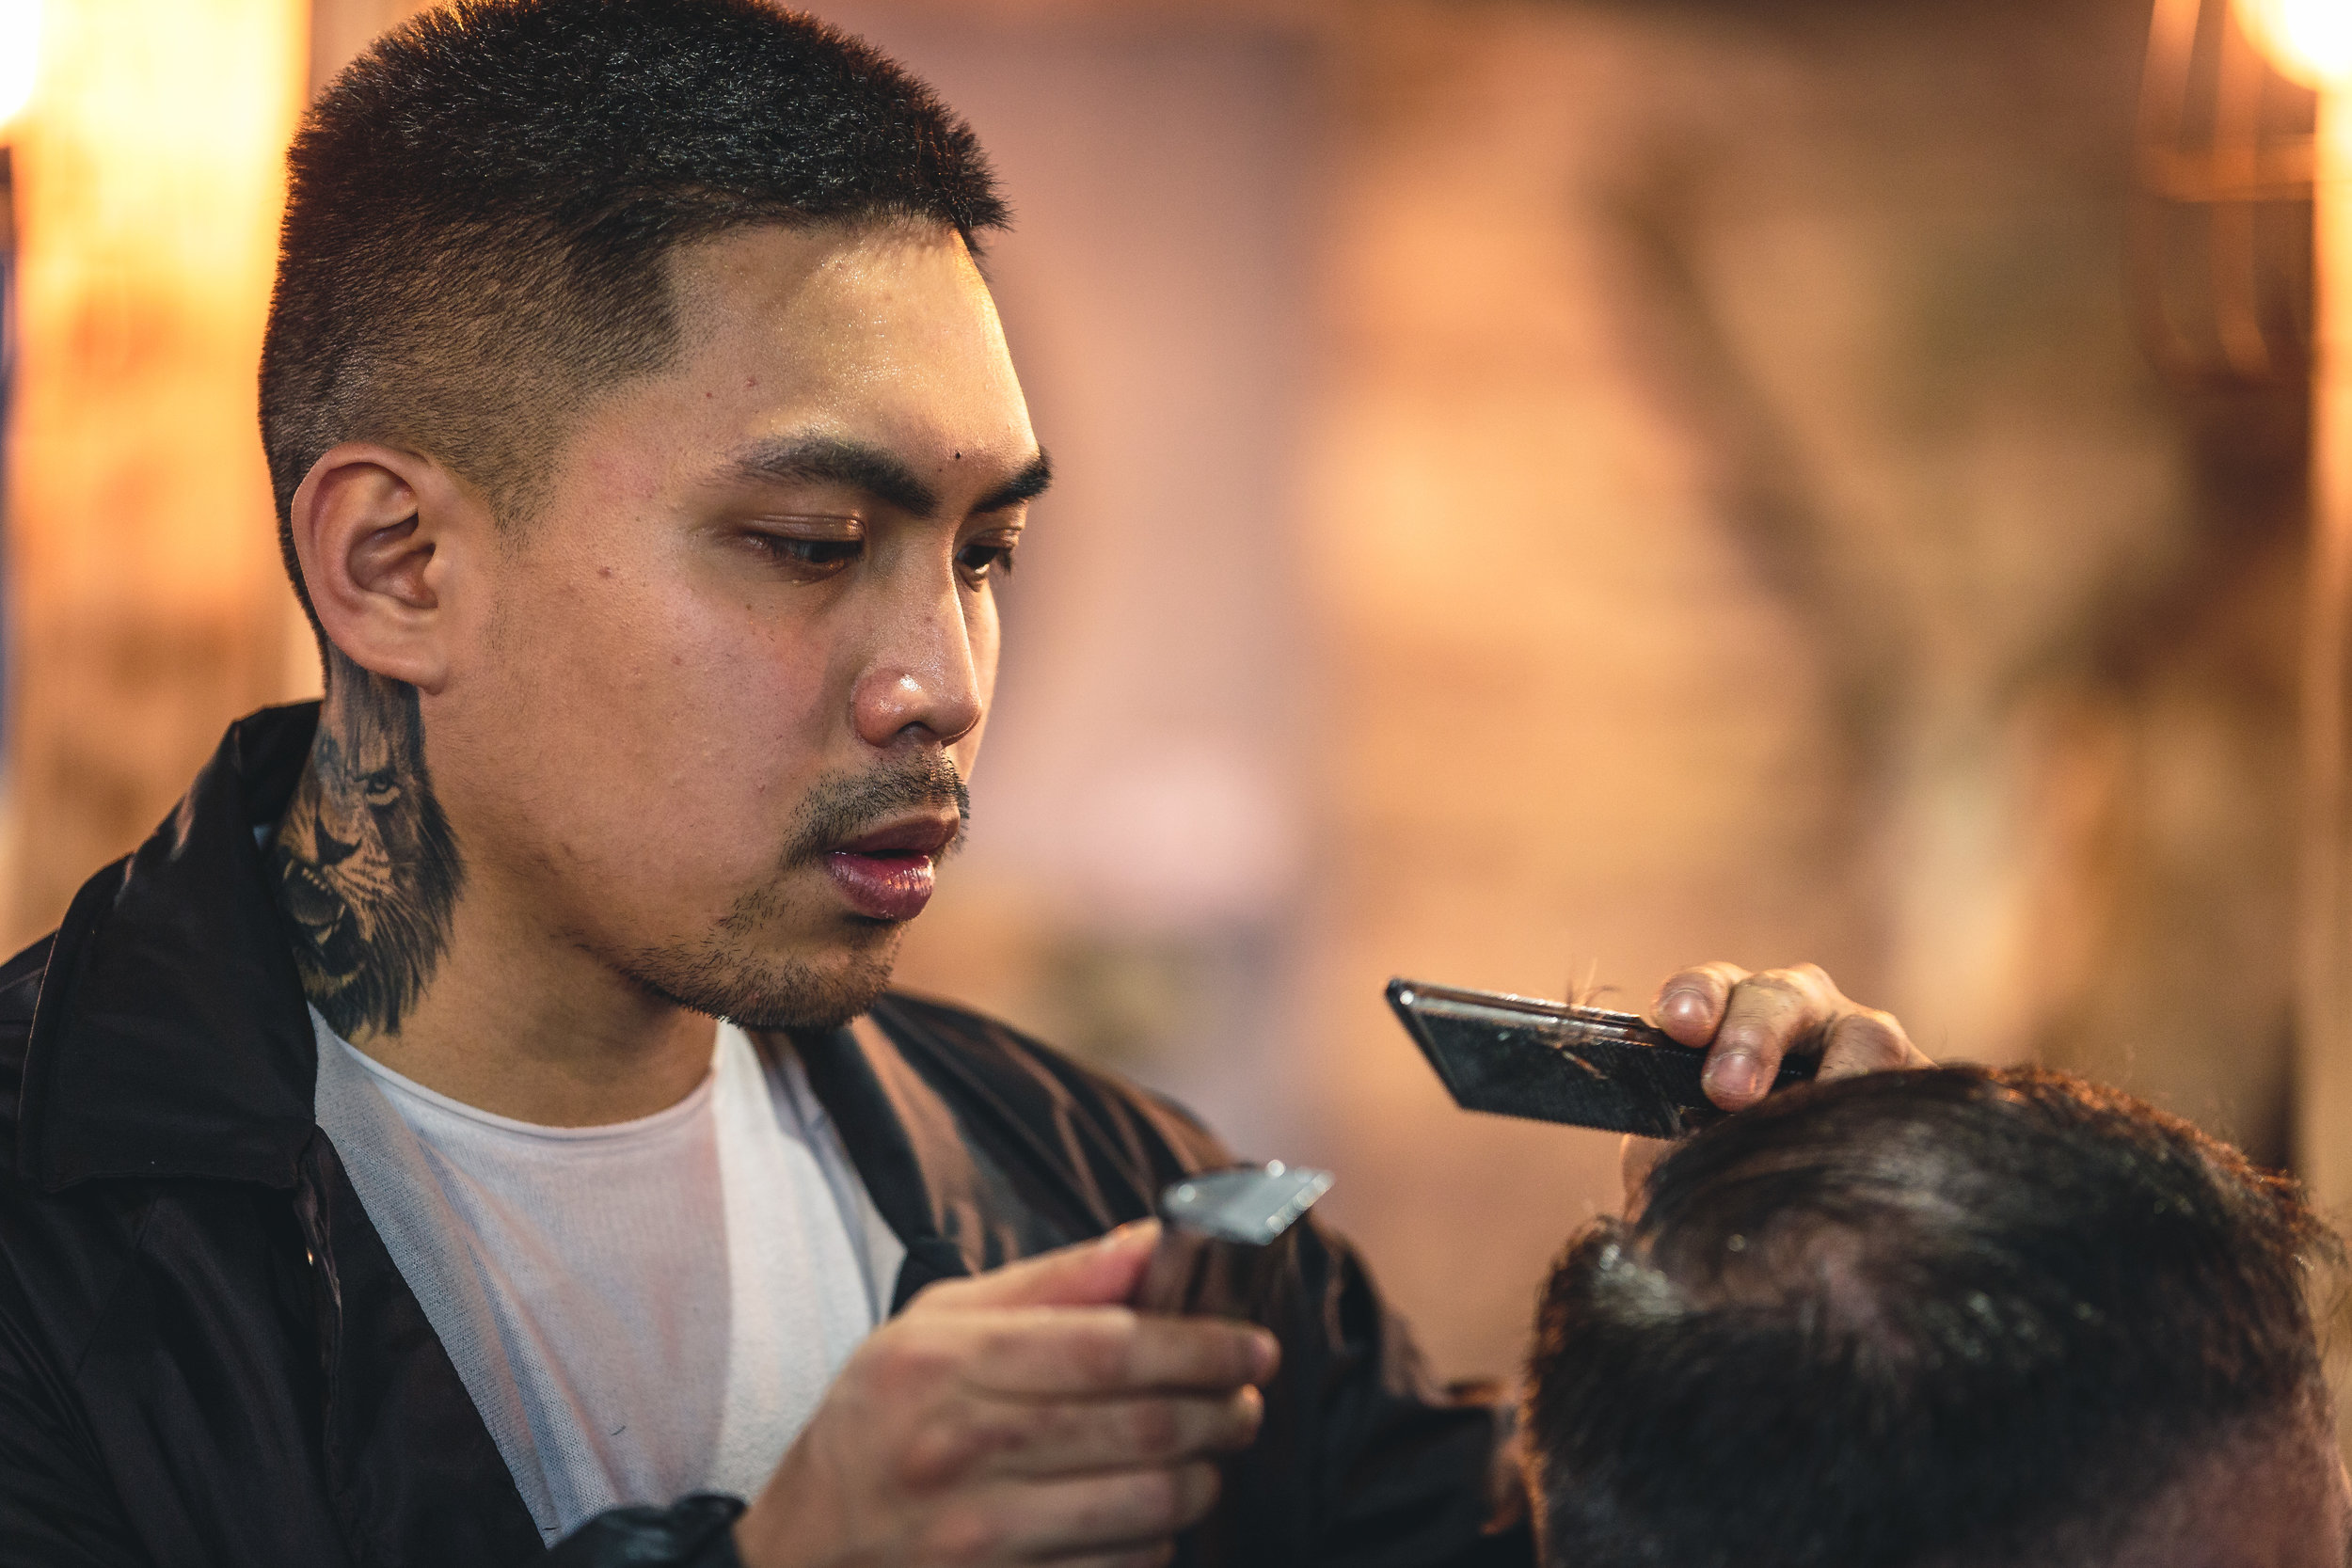 Barber Focus